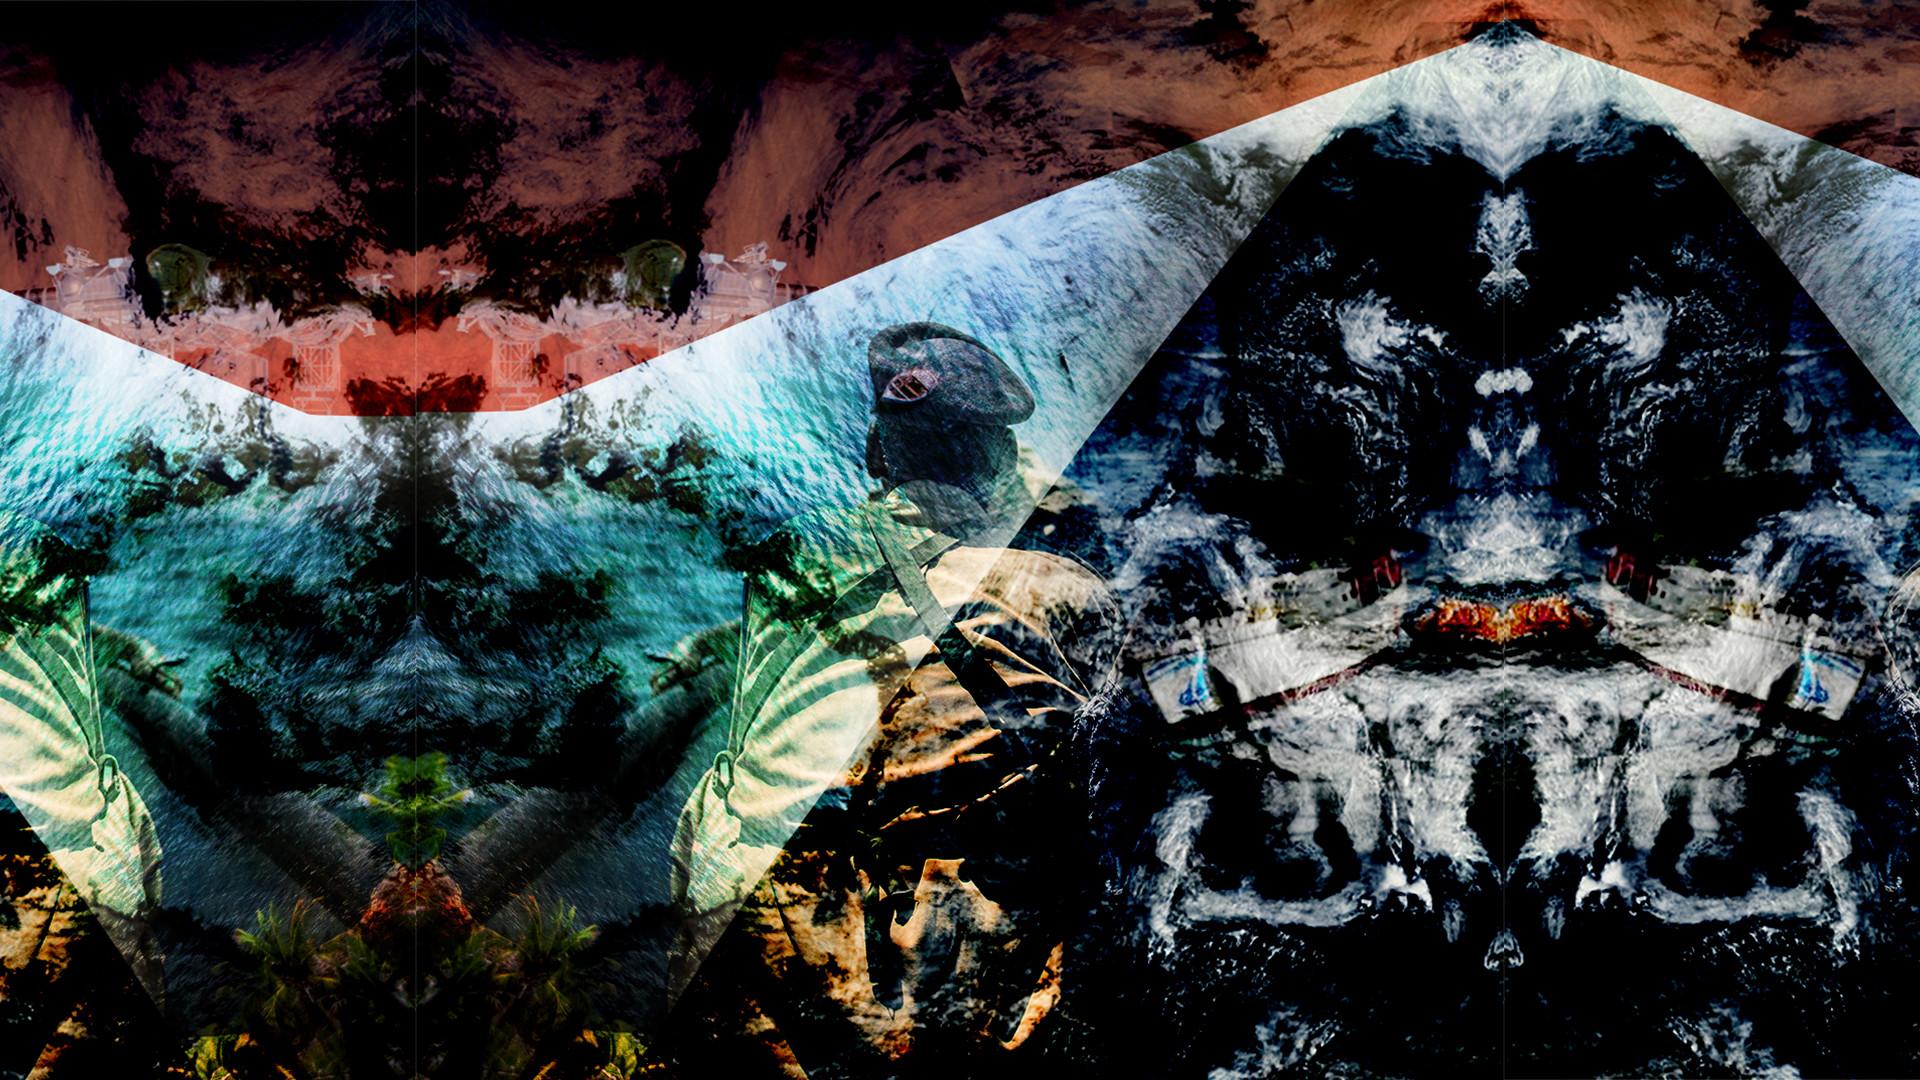 Album cover by Raphaela Morais, The Outlaw Ocean Project.